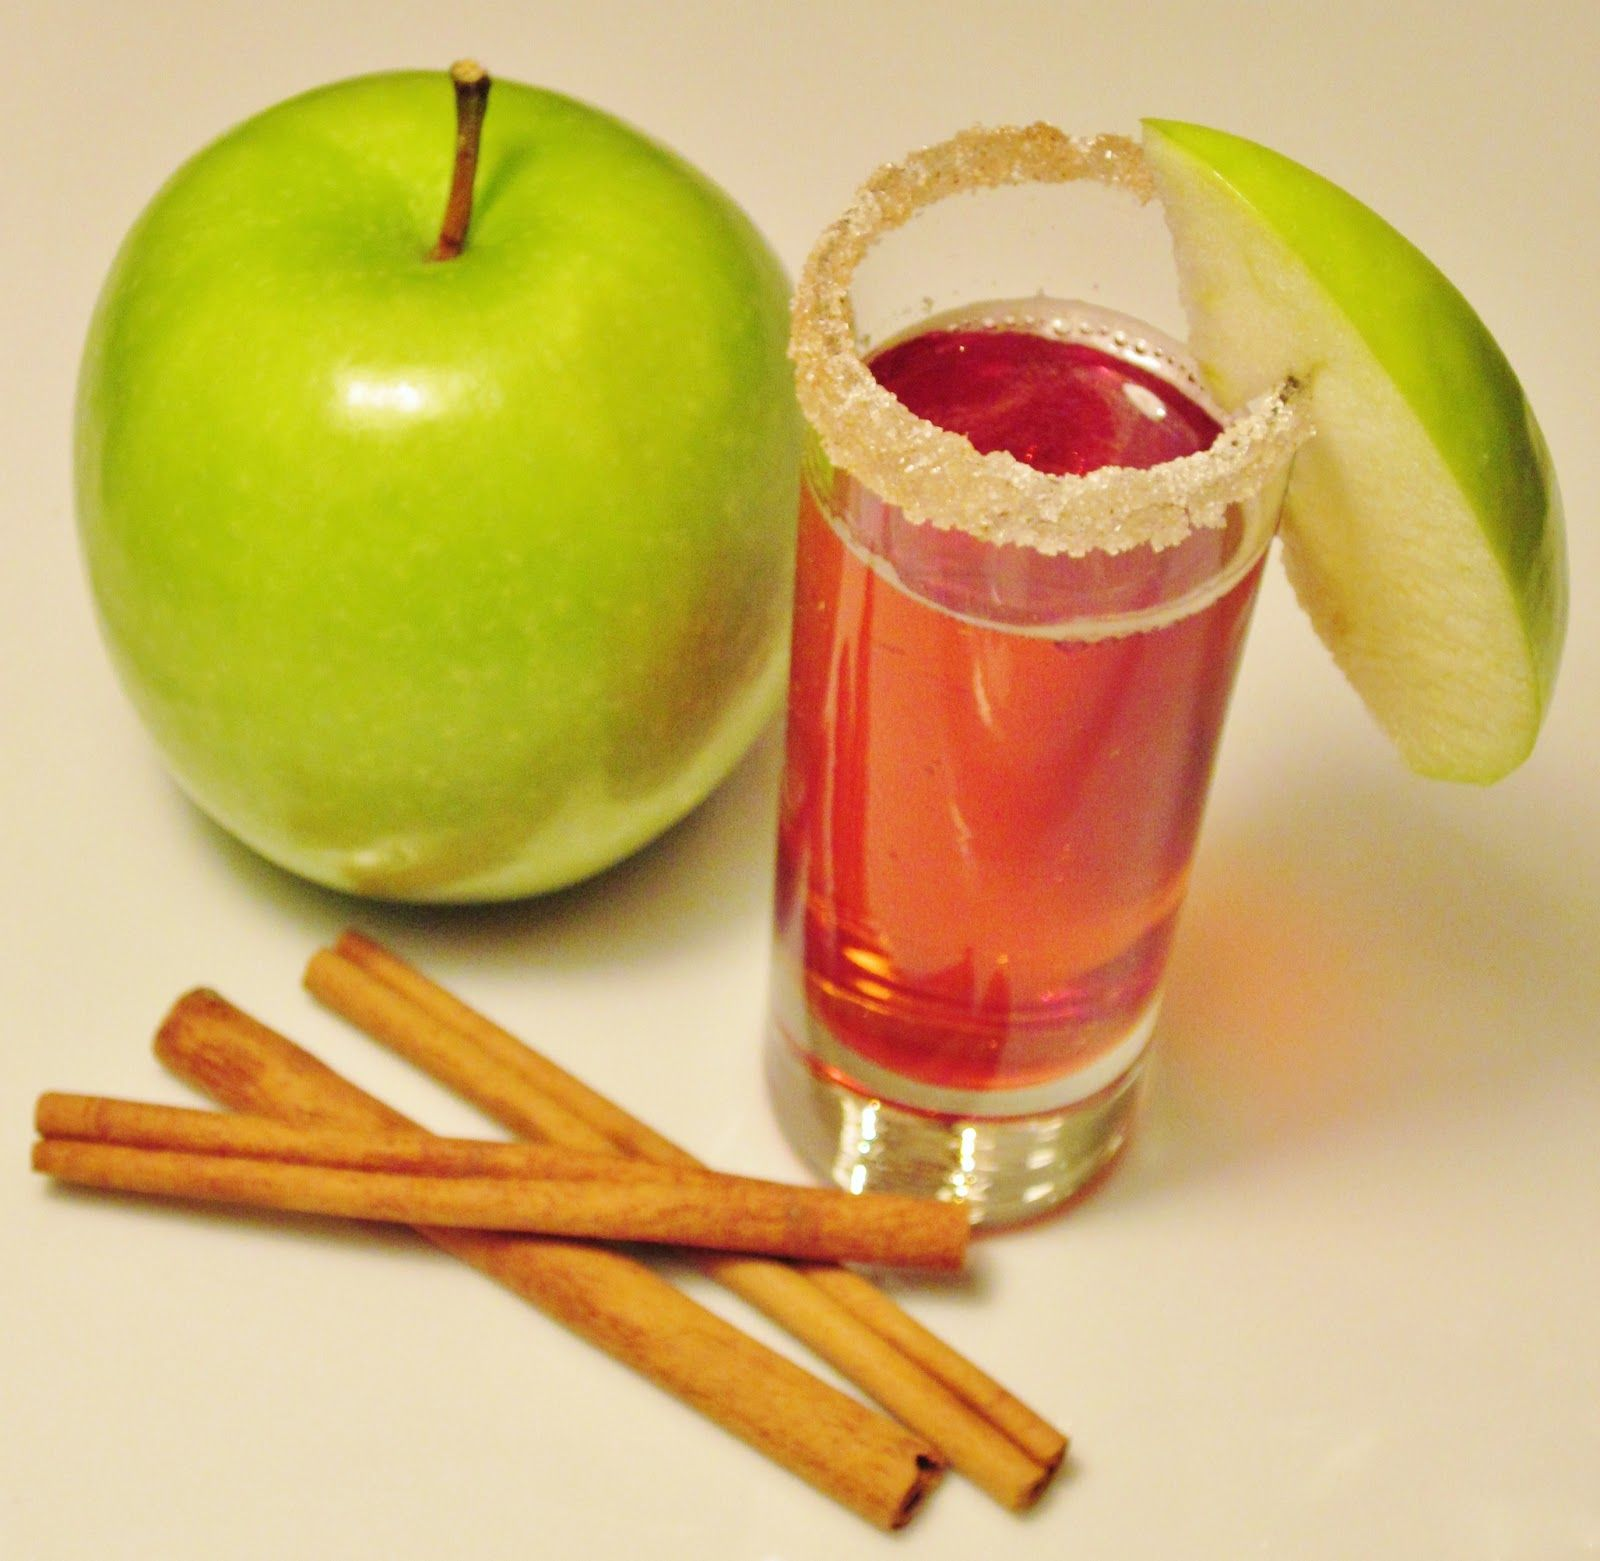 Bonnie Projects Washington Apple Shot Washington Apple Apple Cocktail Recipes Washington Apple Drink,Easy Cold Sandwich Recipes